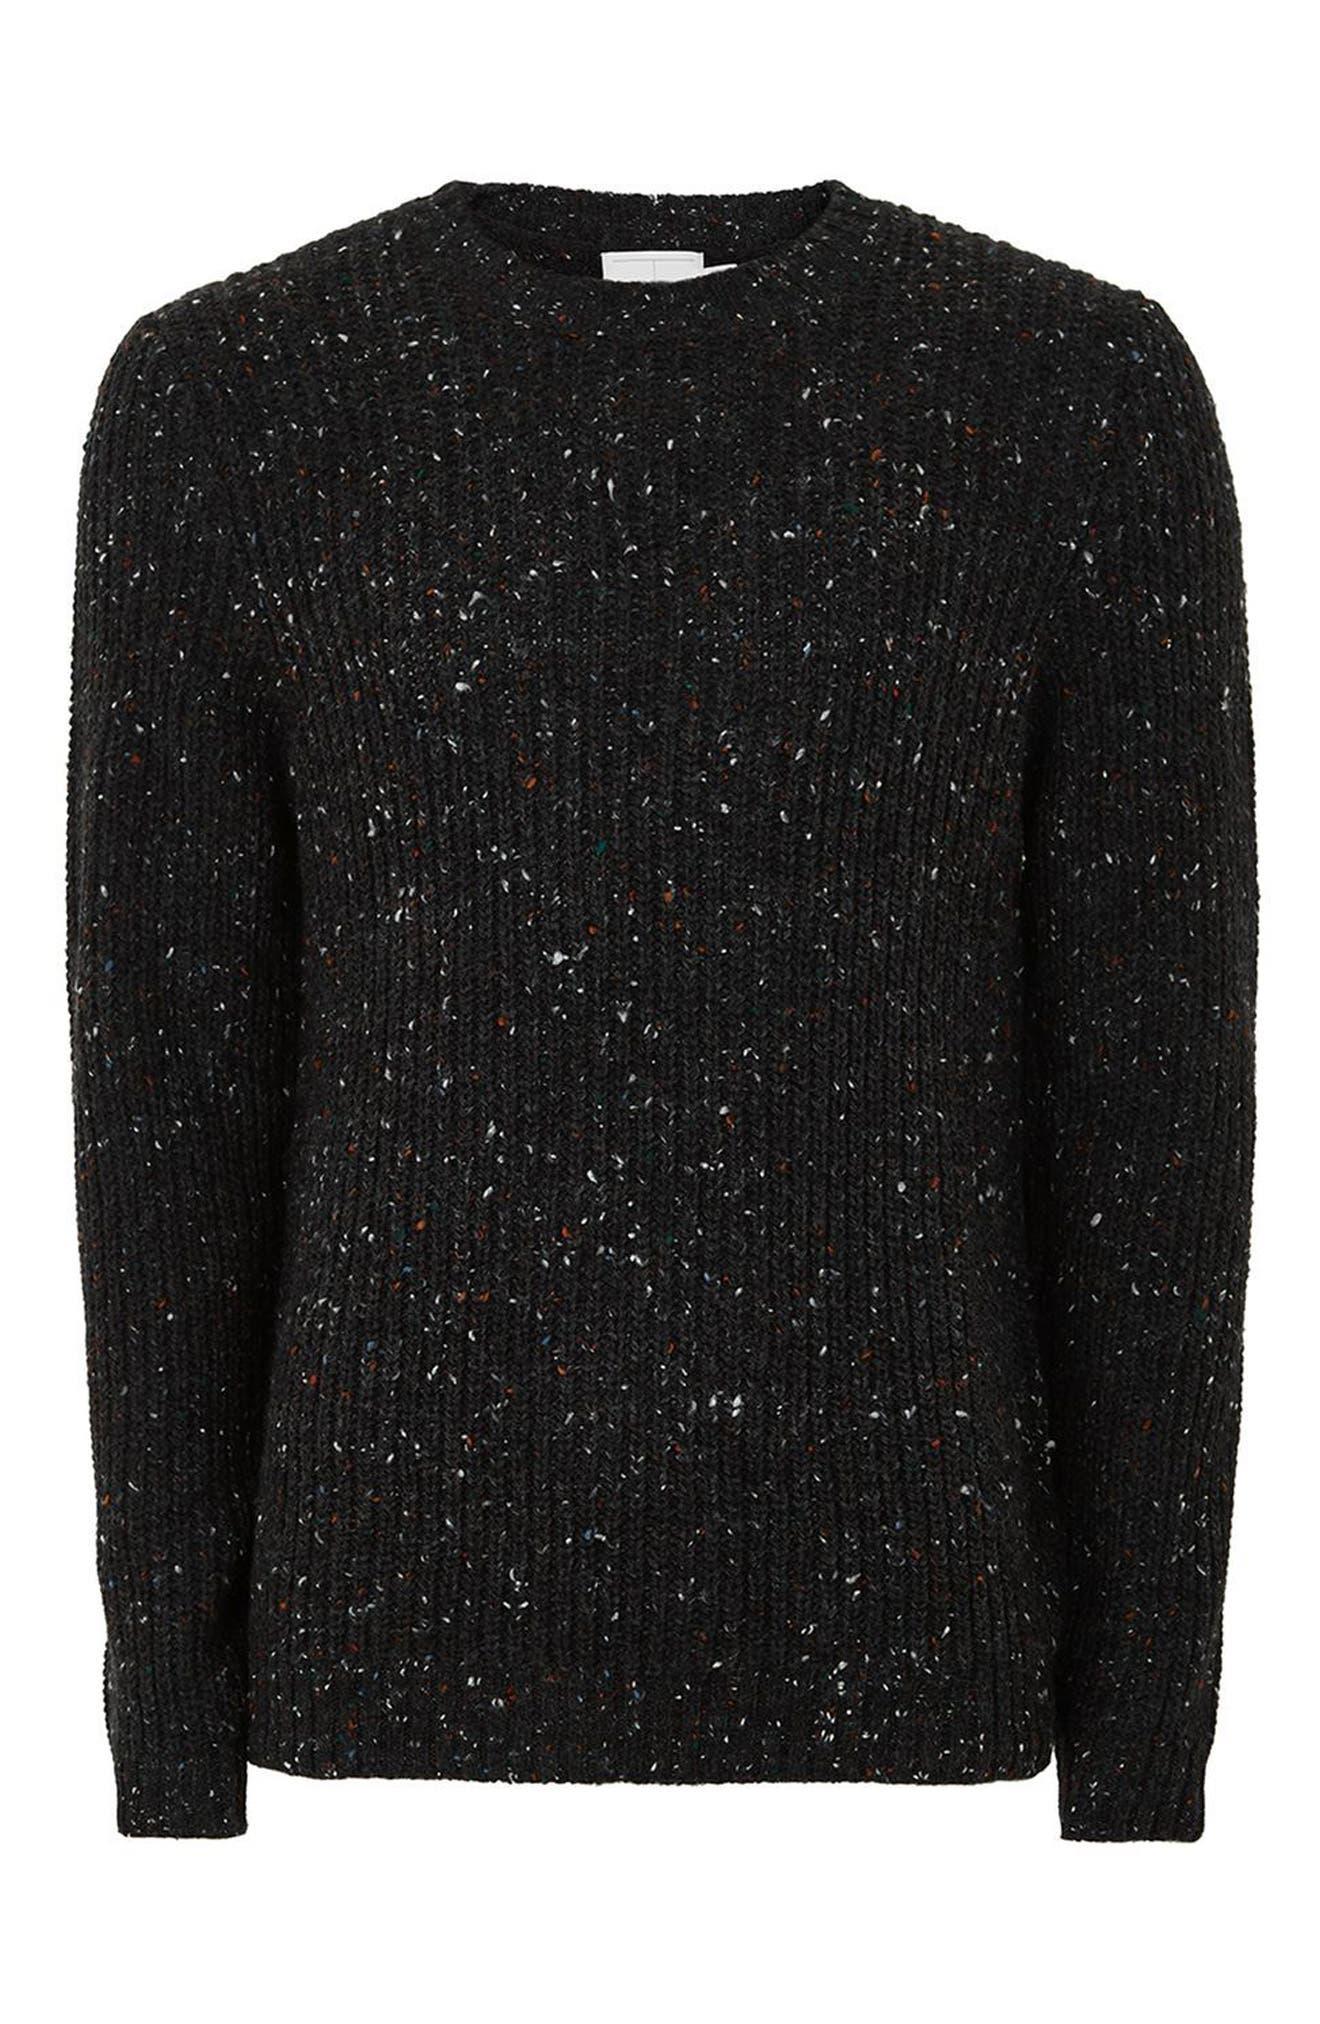 Premium Fisherman Sweater,                             Alternate thumbnail 4, color,                             Charcoal